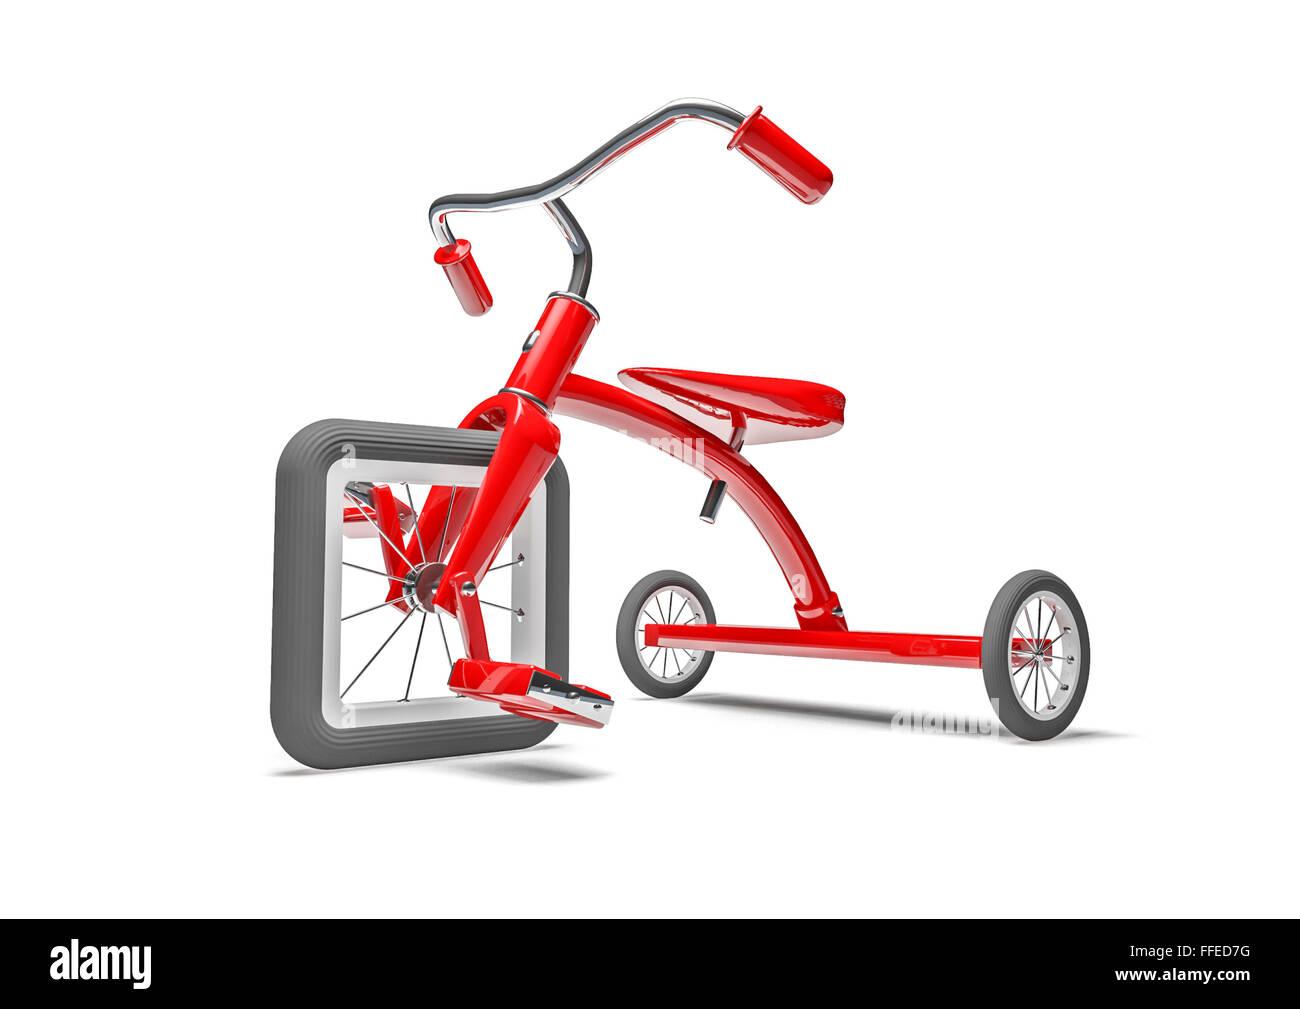 https://c8.alamy.com/compfr/ffed7g/tricycle-a-defaut-de-conception-3d-render-of-tricycle-a-pneu-avant-carre-ffed7g.jpg